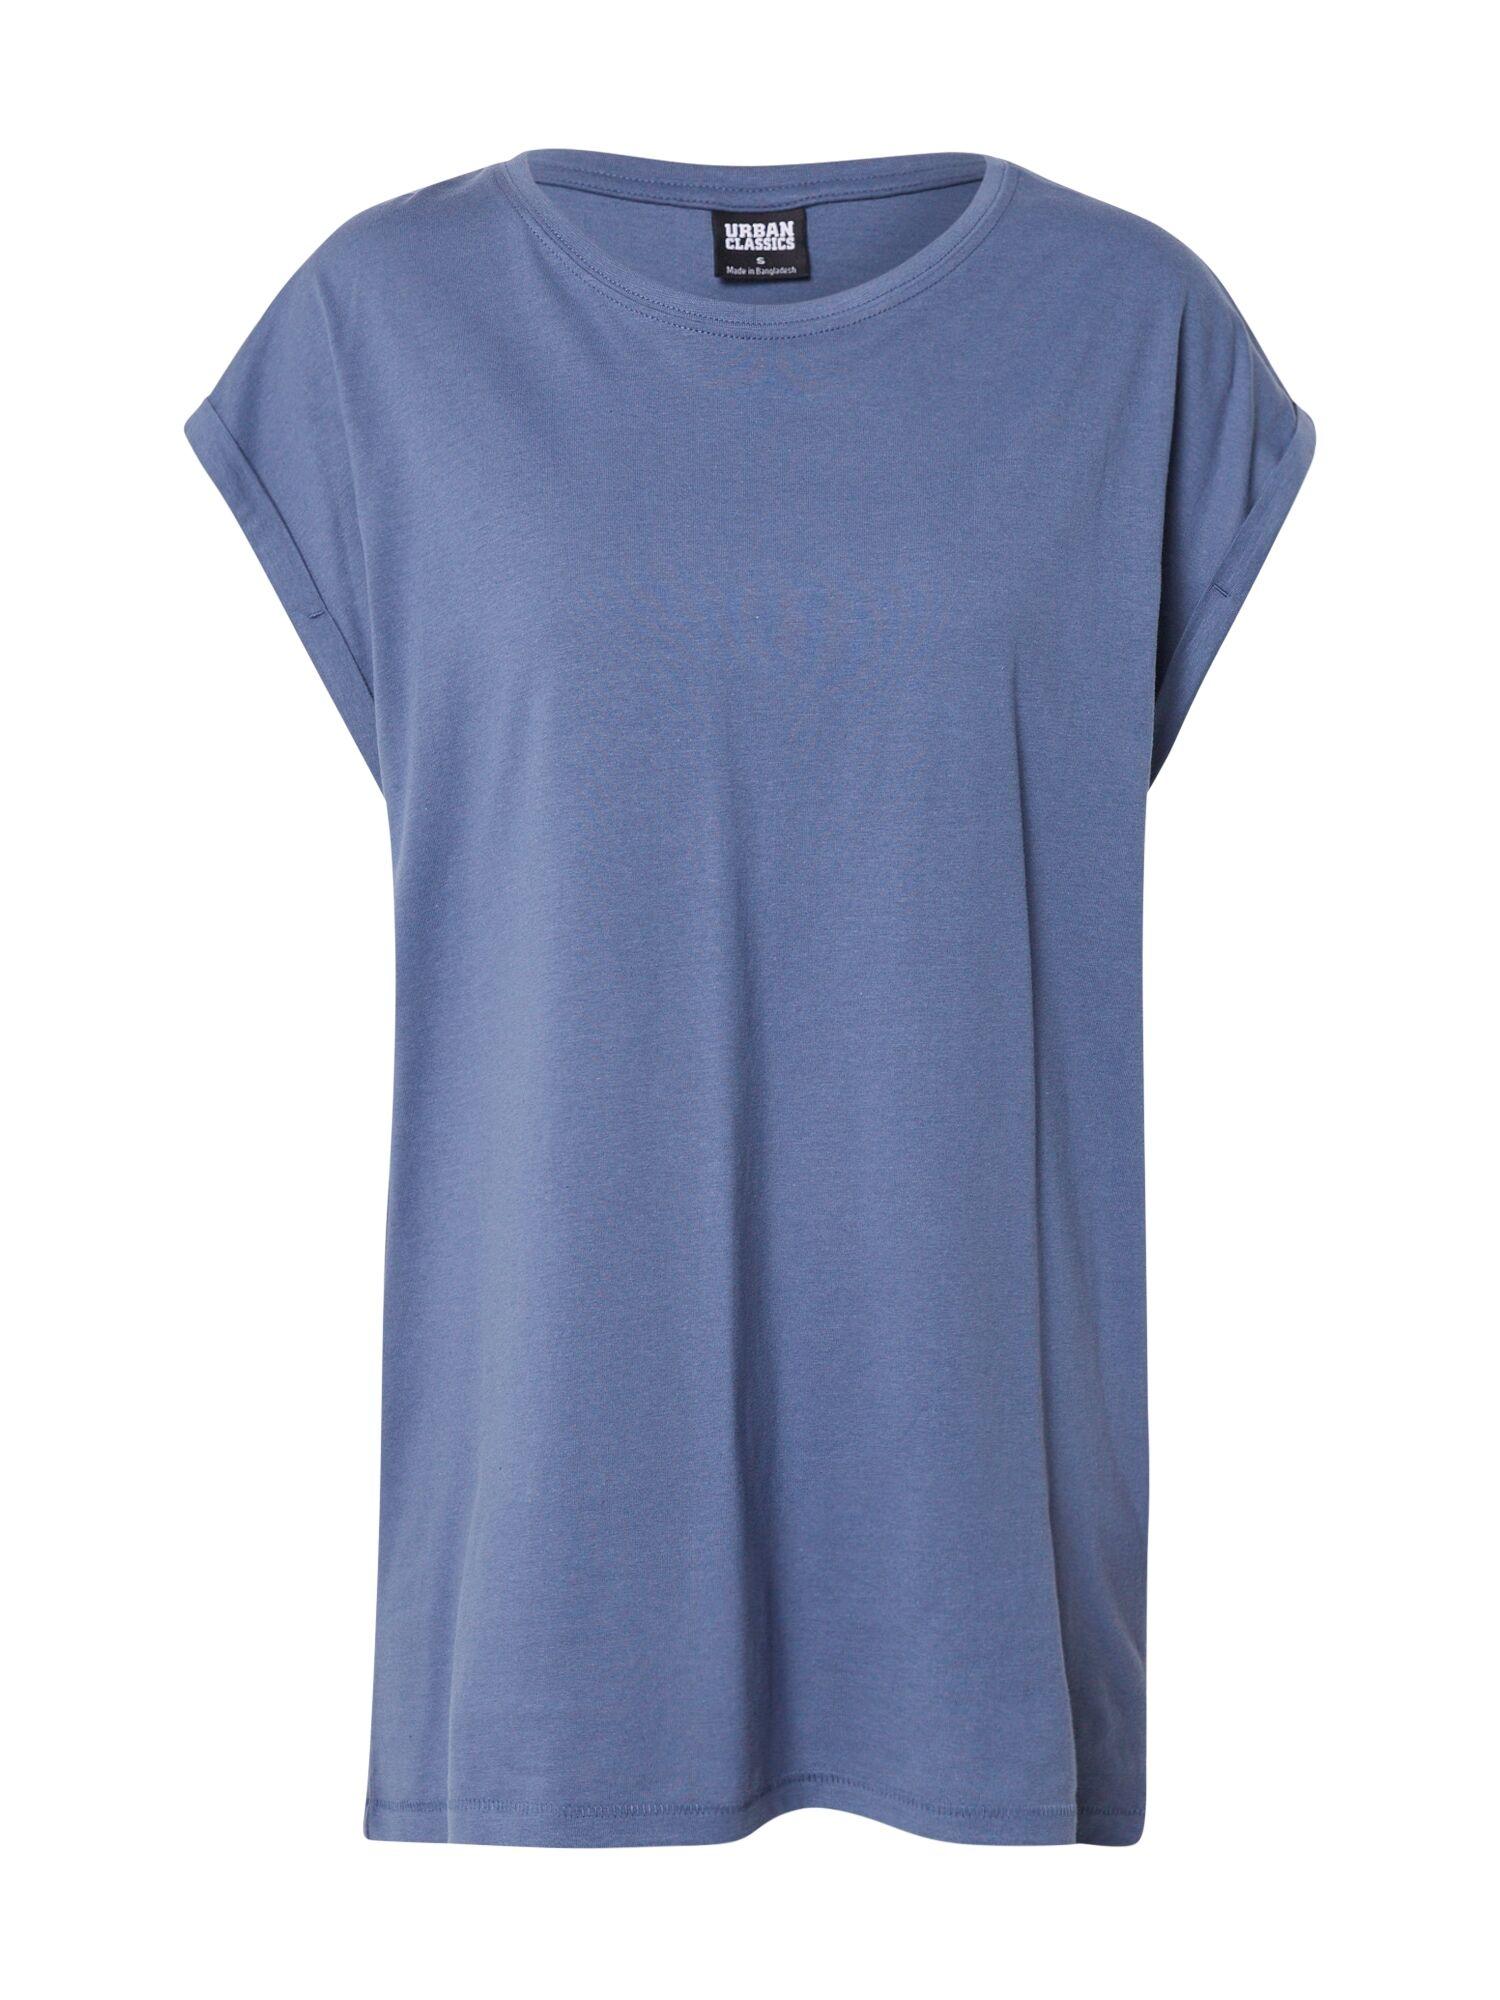 Urban Classics Curvy T-shirt  - Bleu - Taille: XS - female